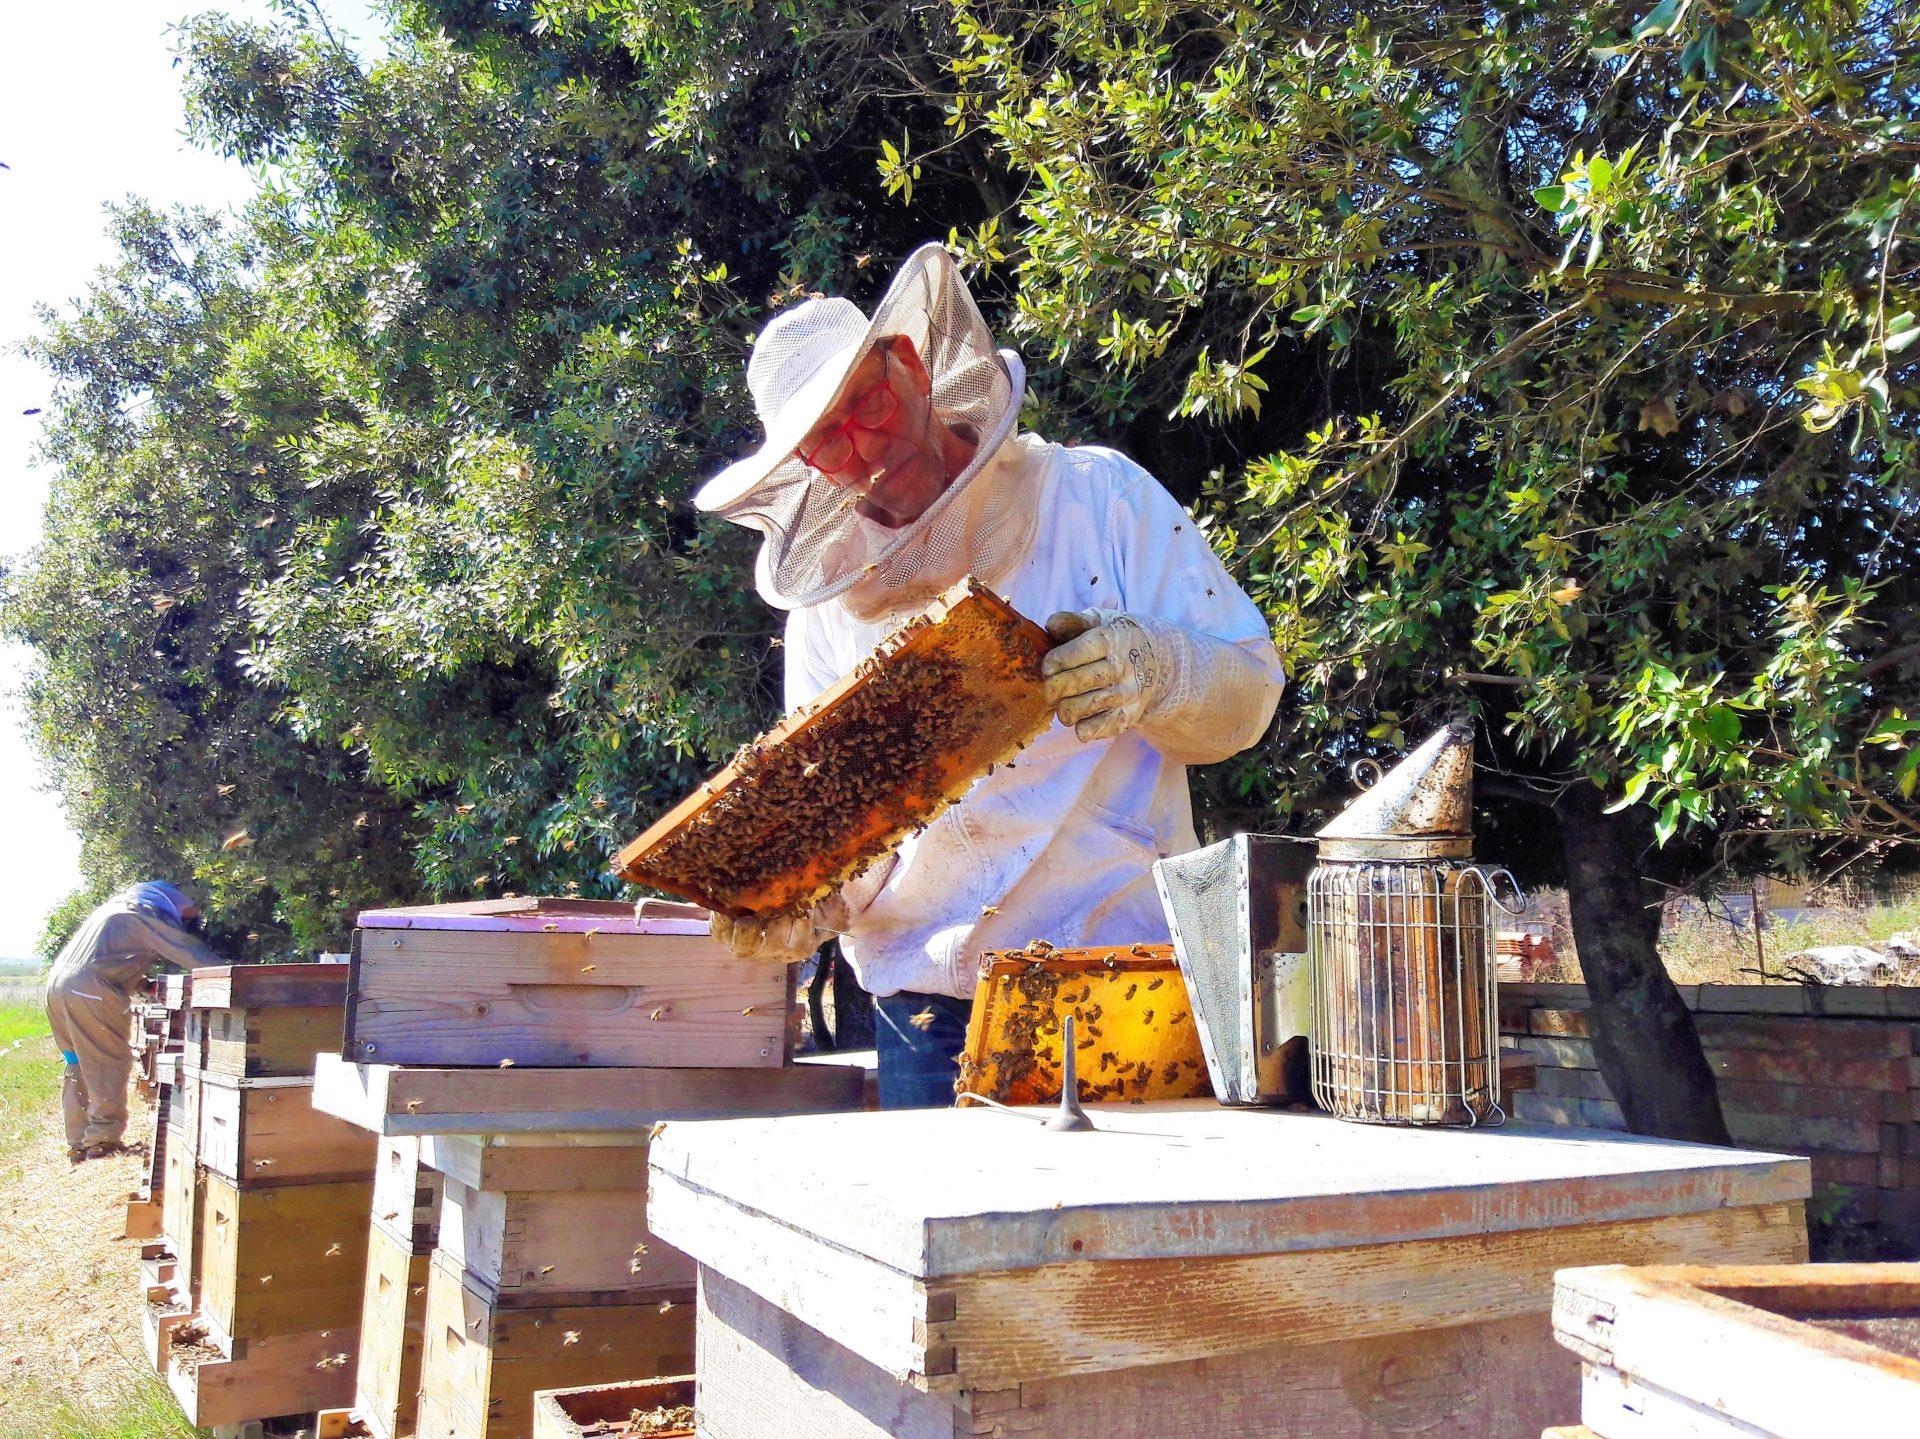 Imker-Imkerei-Entnahme der Bienenwaben